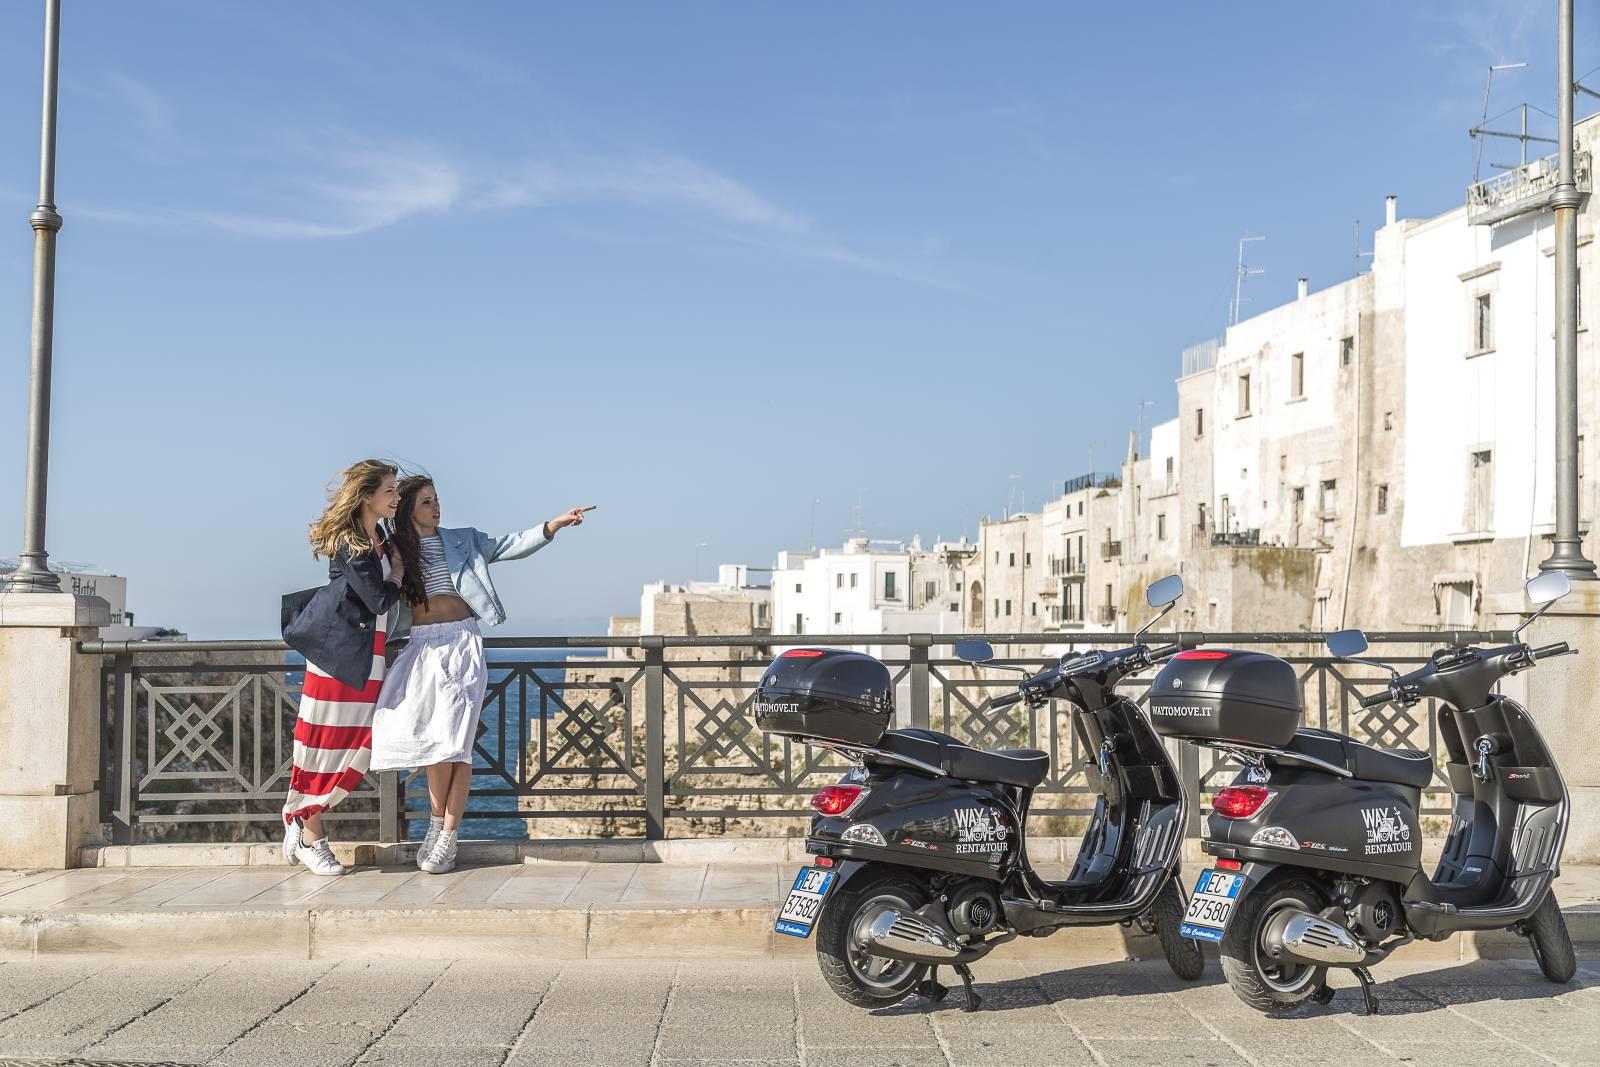 Creazione Sito web Turismo Noleggio Veicoli: Way to Move - Maingage, Web Agency Bari